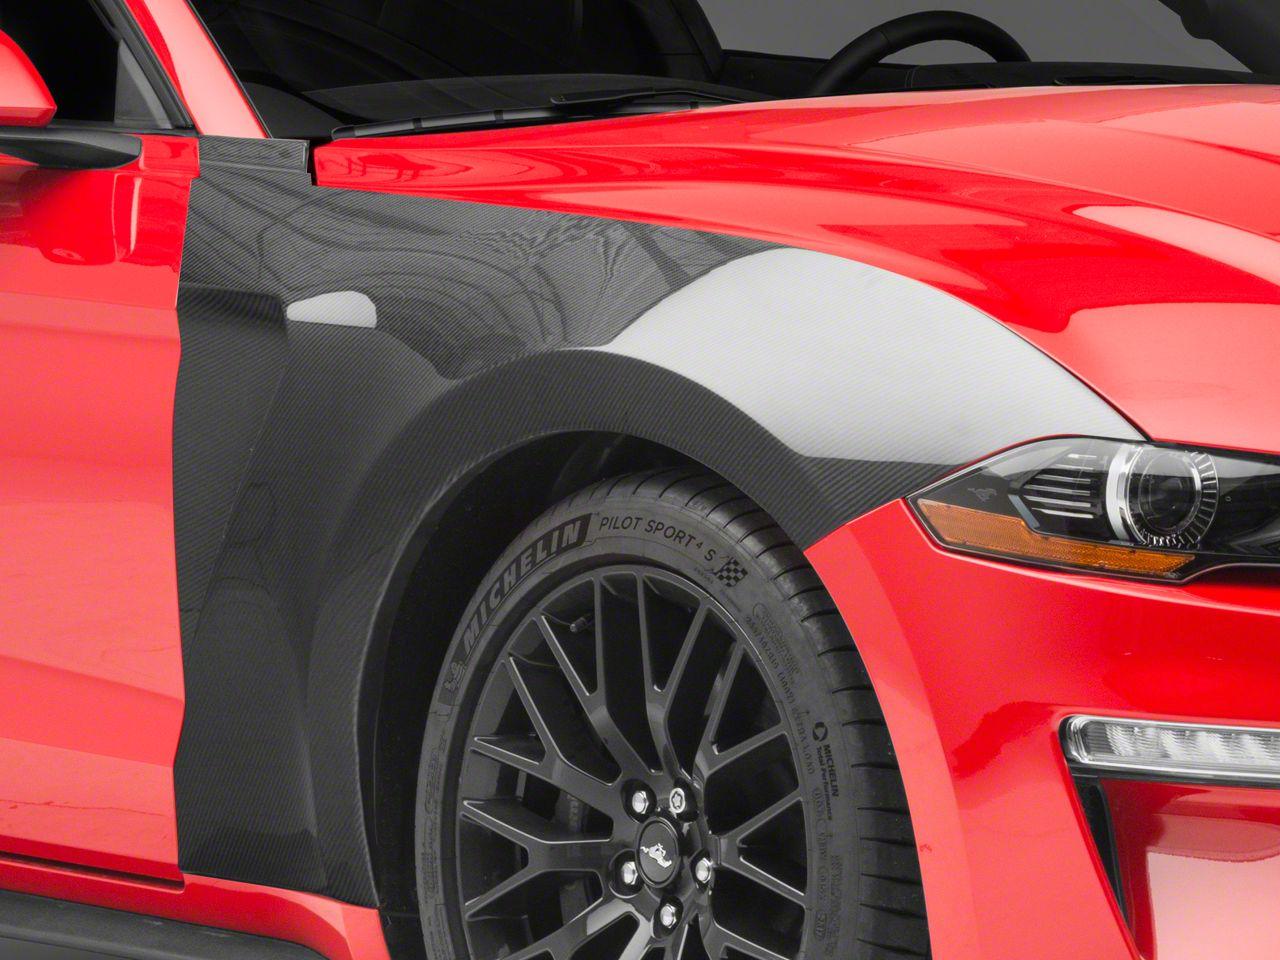 Anderson Composites Type-GR GT350 Style Front Fenders - Carbon Fiber (18-19 GT, EcoBoost)